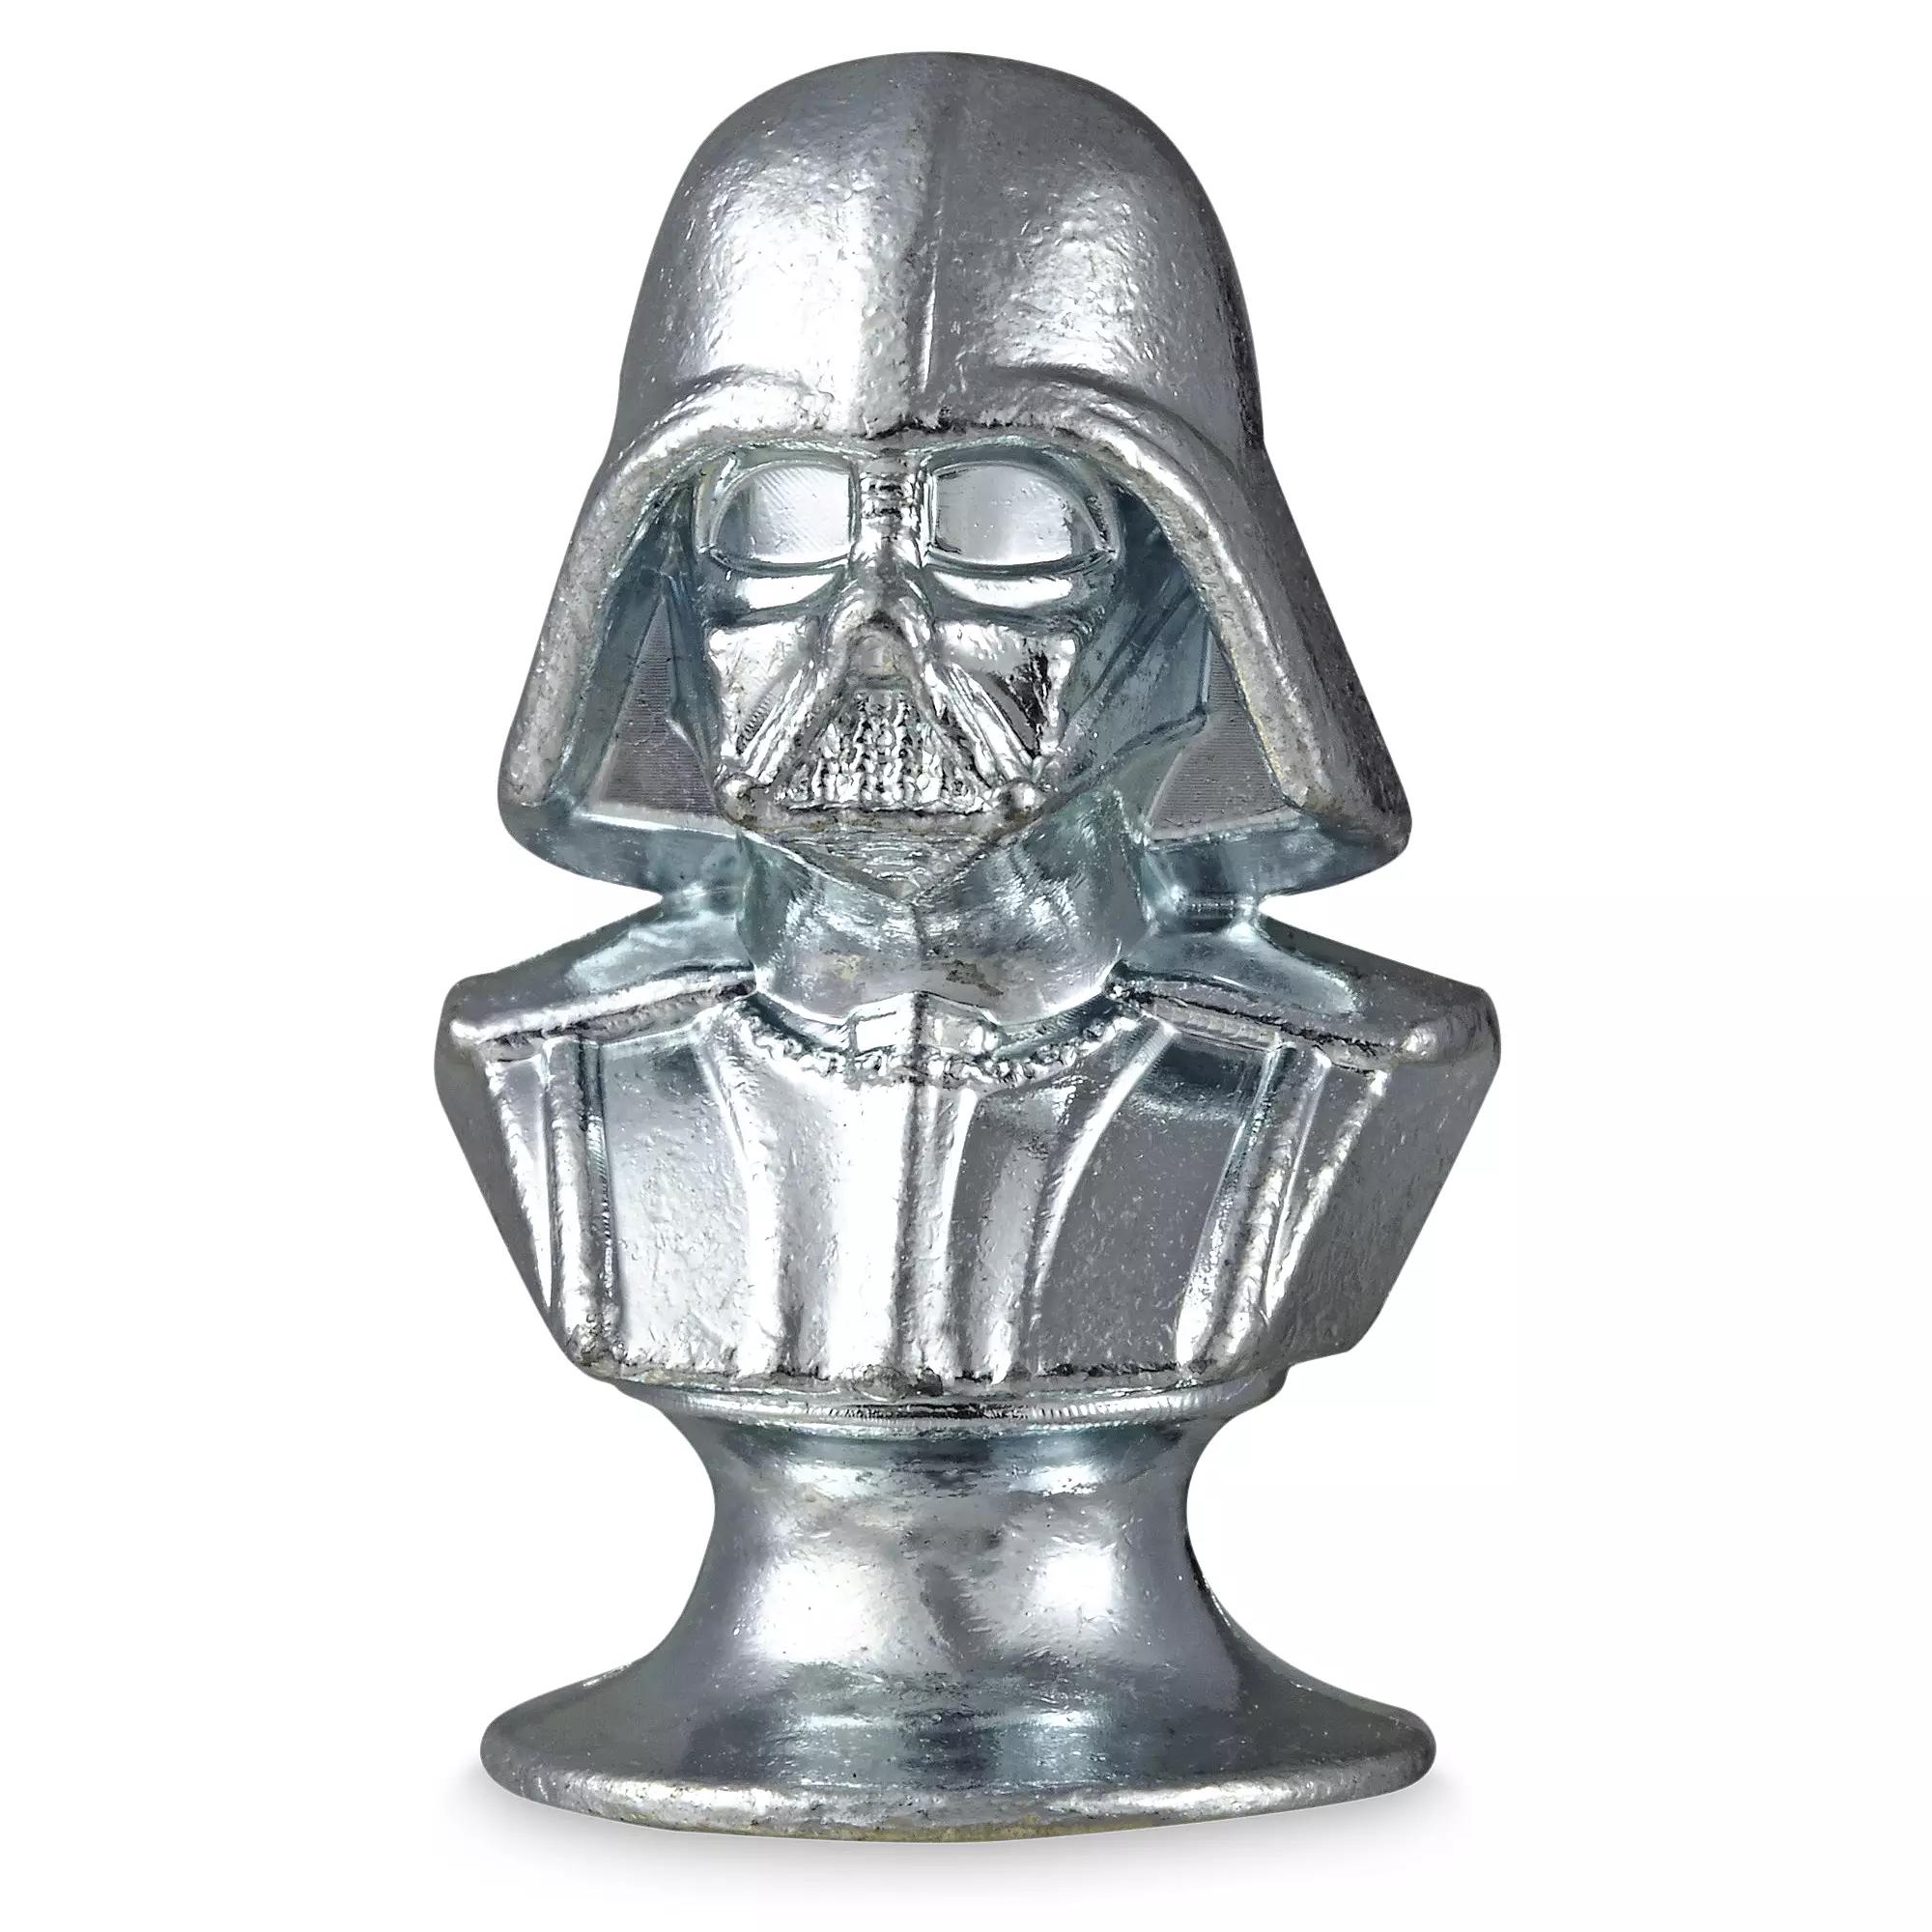 Monopoly Star Wars - Darth Vader